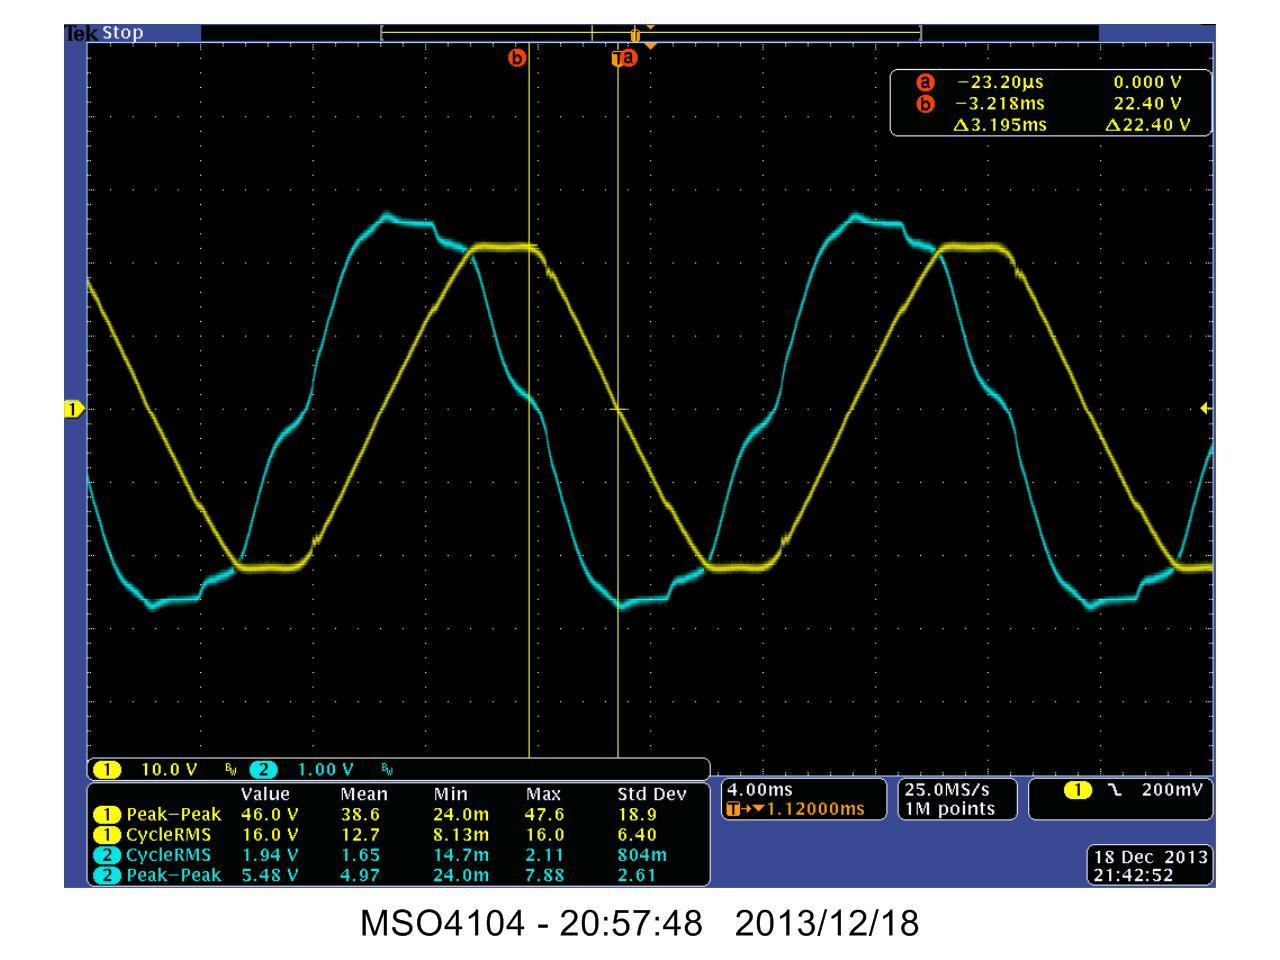 Series Rlc Circuit Response To Sinusoidal Input Voltage Momoyama Works Control Diagram Transformer Phasor 02